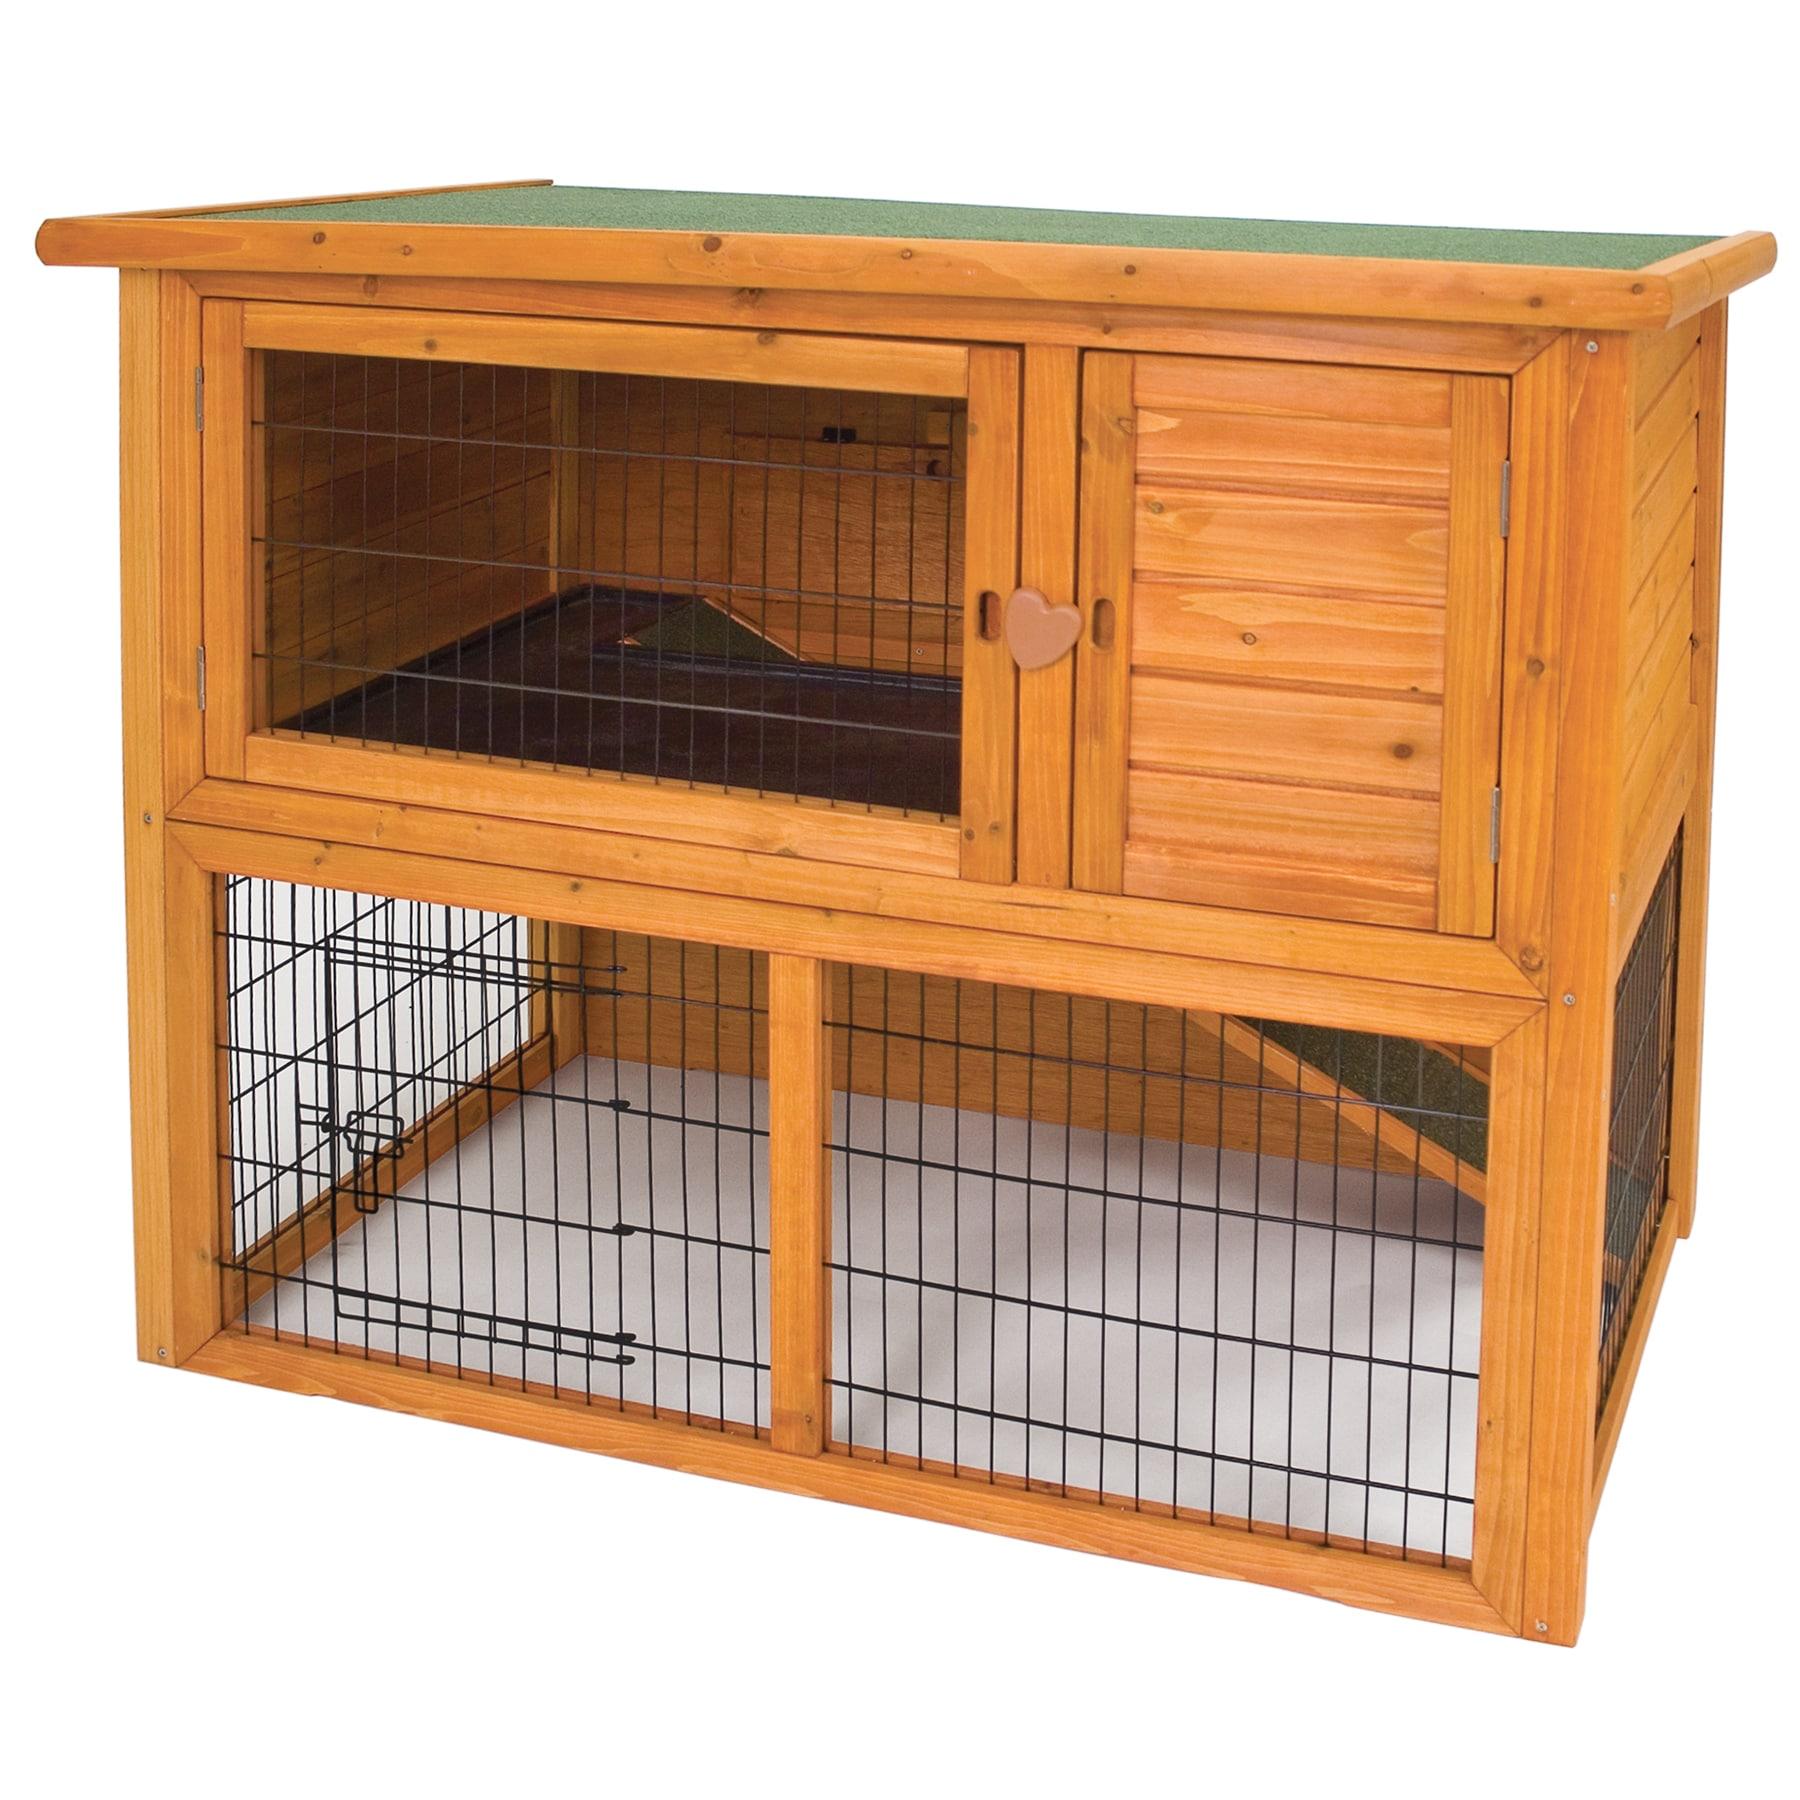 Ware Manufacturing 01517 Premium Penthouse Rabbit Hutch (...